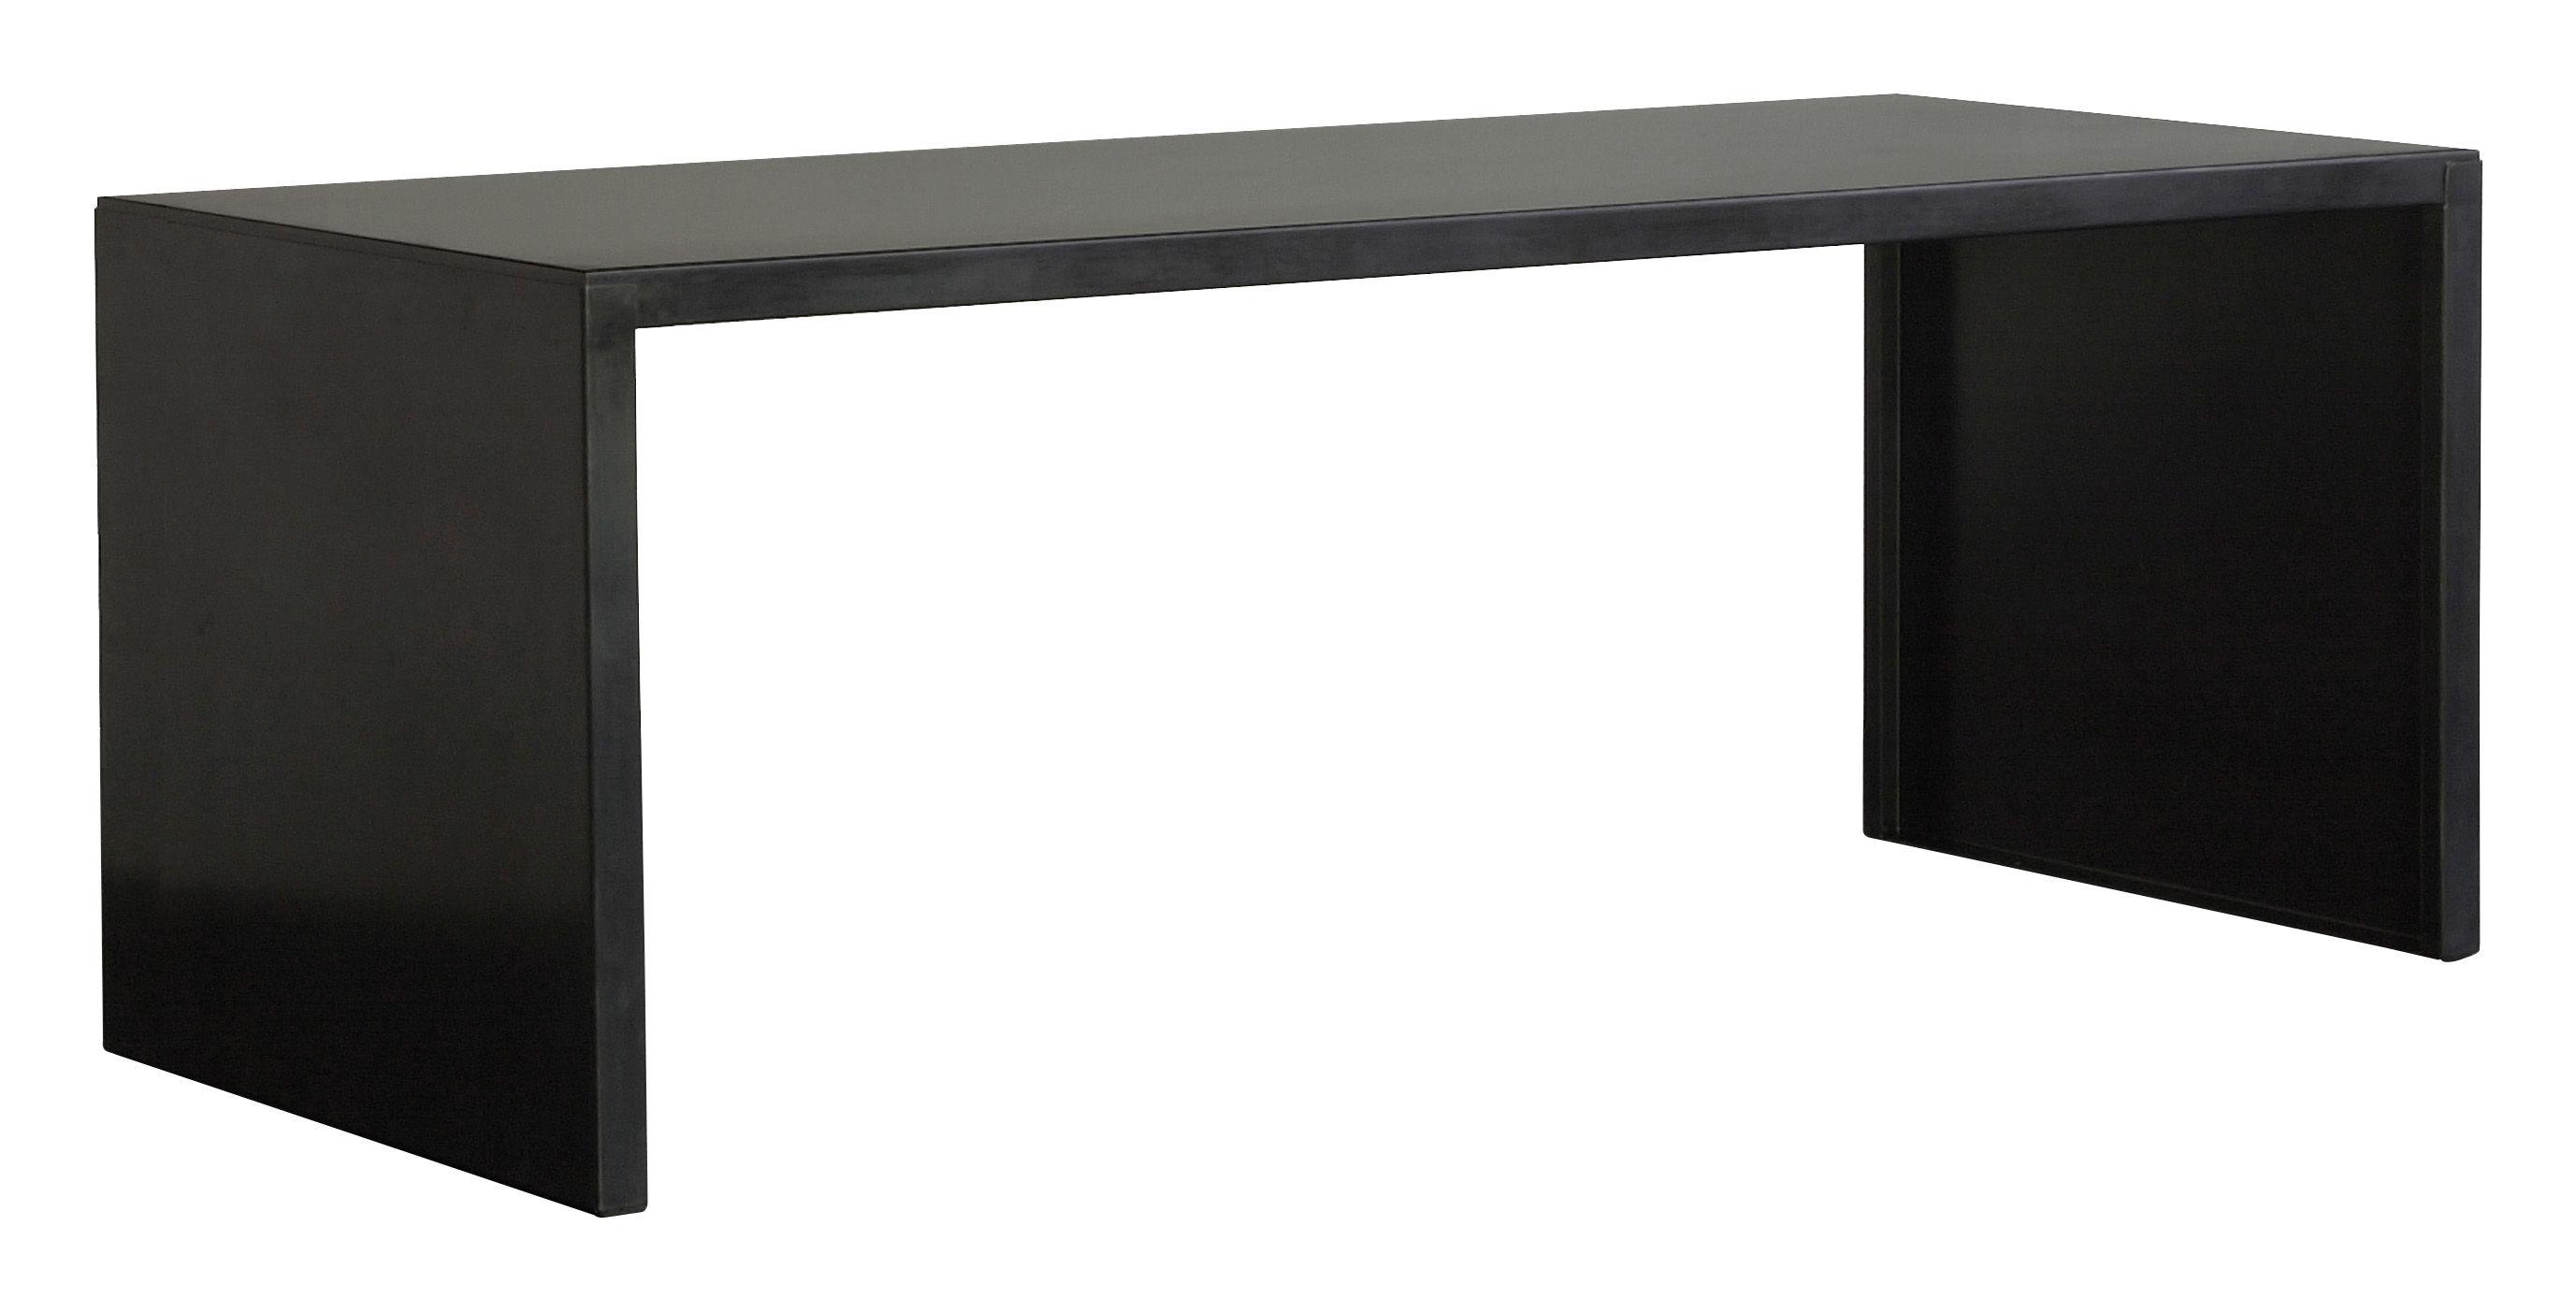 Möbel - Tische - Big Irony Desk rechteckiger Tisch - L 160 cm - Zeus - Phosphatiertes Stahlblech schwarz - 160 x 75 cm - phosphatierter Stahl